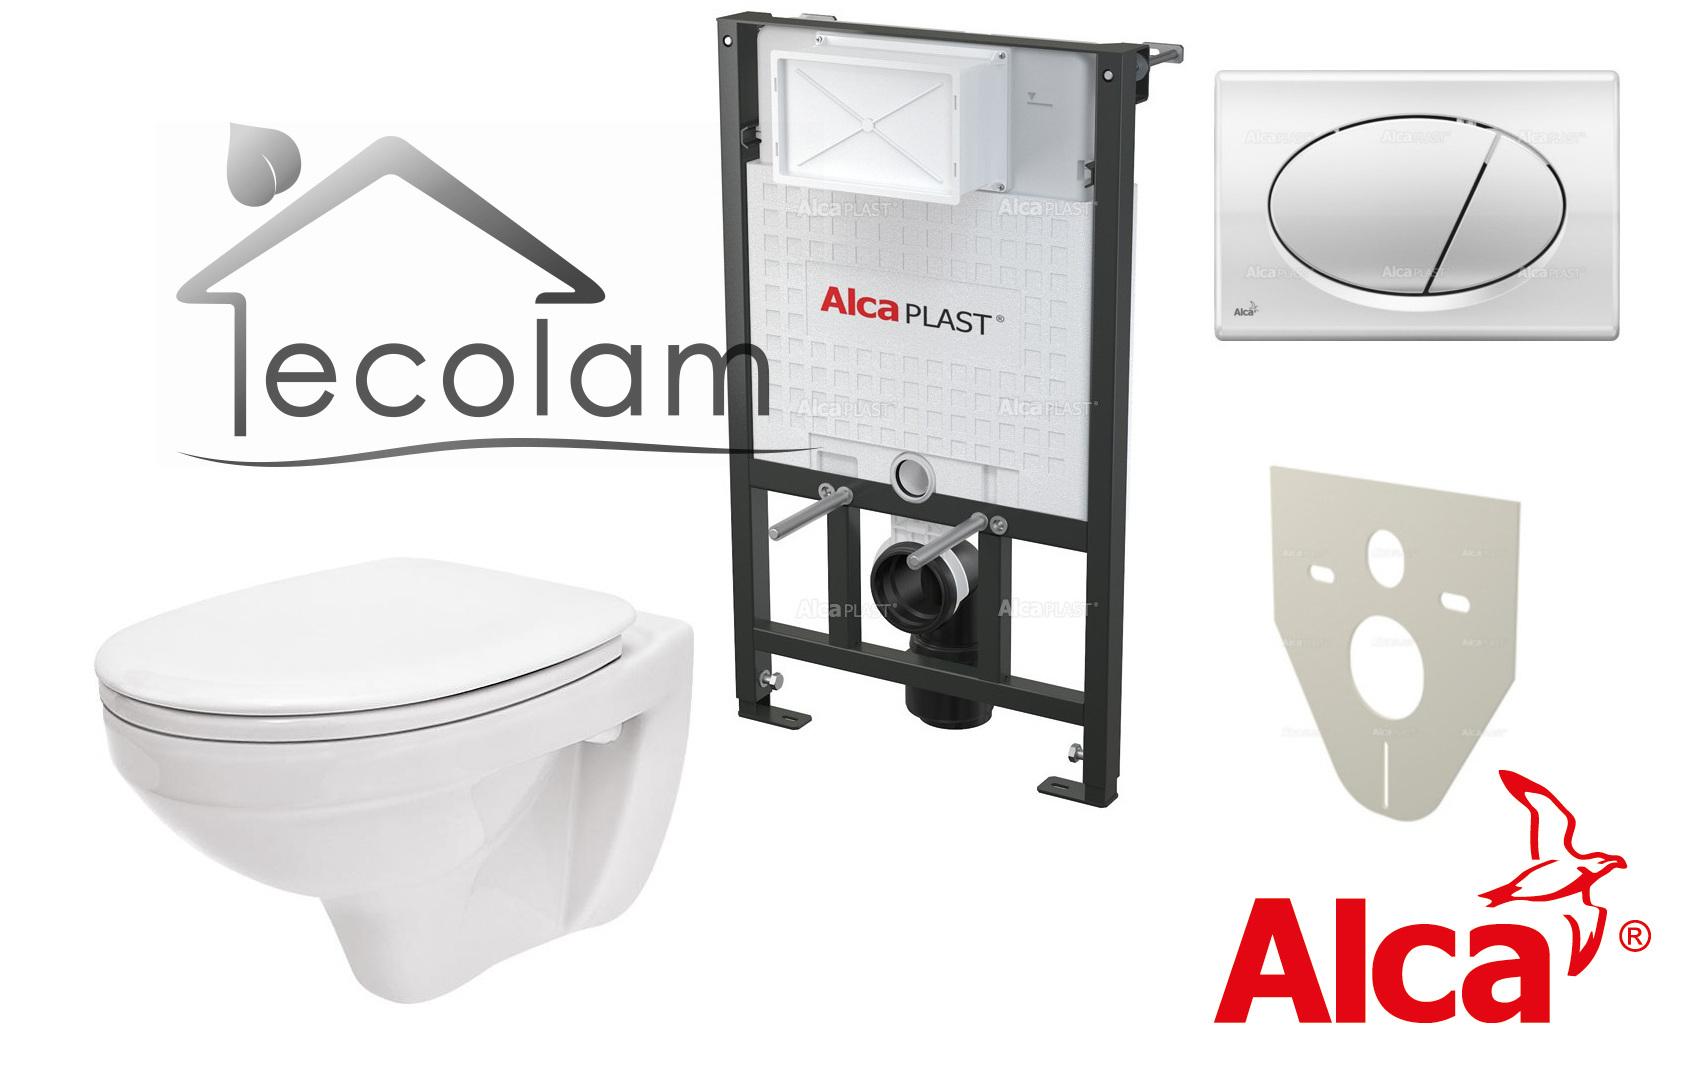 toilette mit splkasten stand wc set toilette abgang. Black Bedroom Furniture Sets. Home Design Ideas